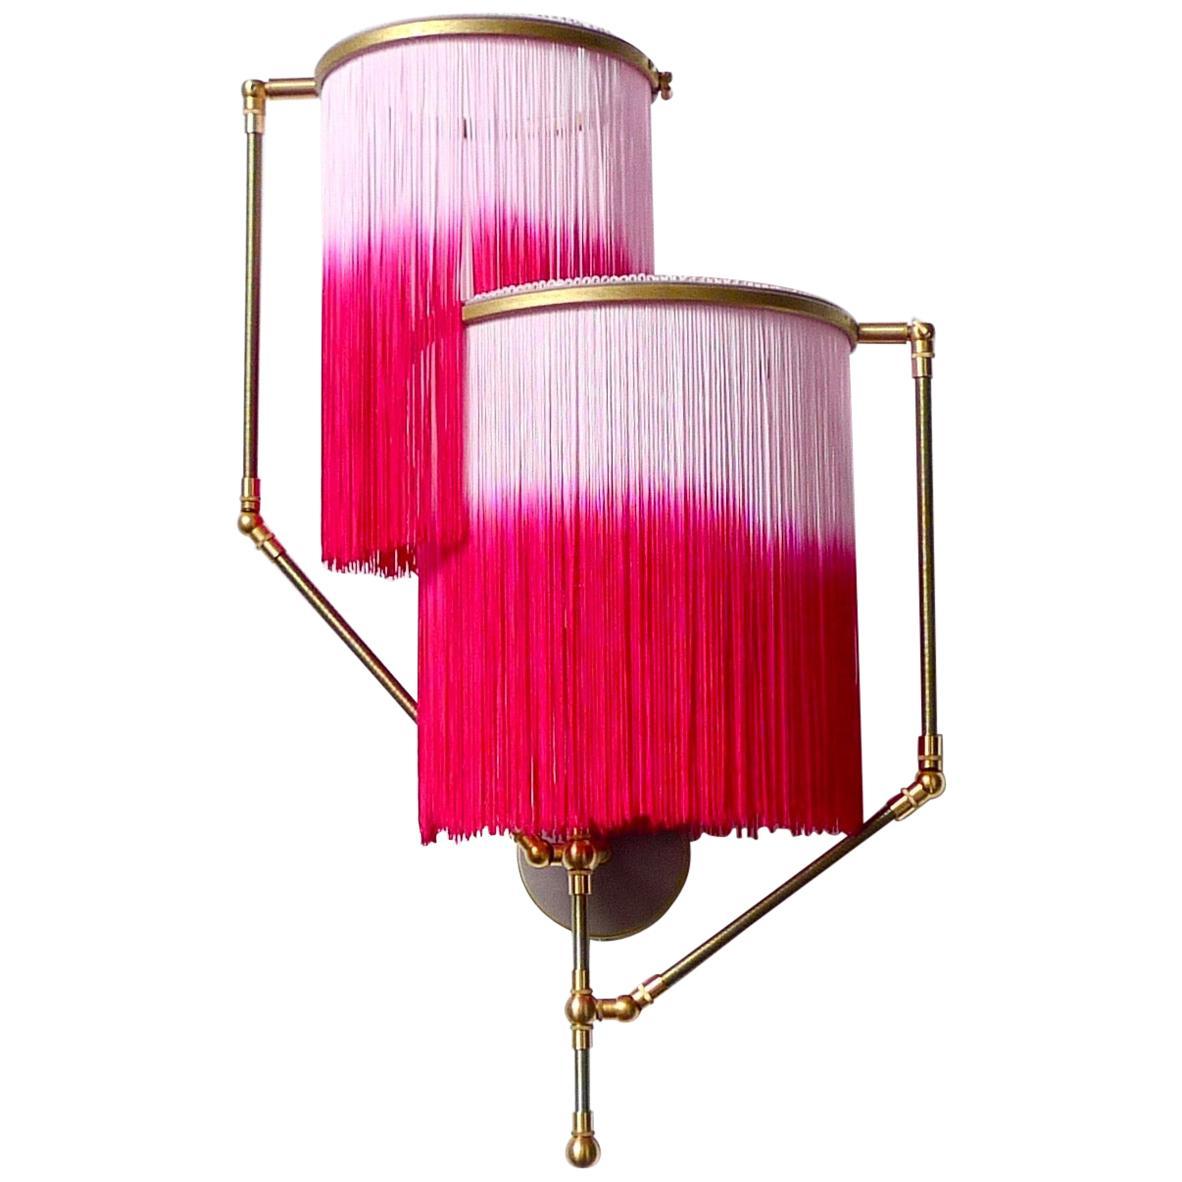 Pink Charme Sconce Lamp, Sander Bottinga